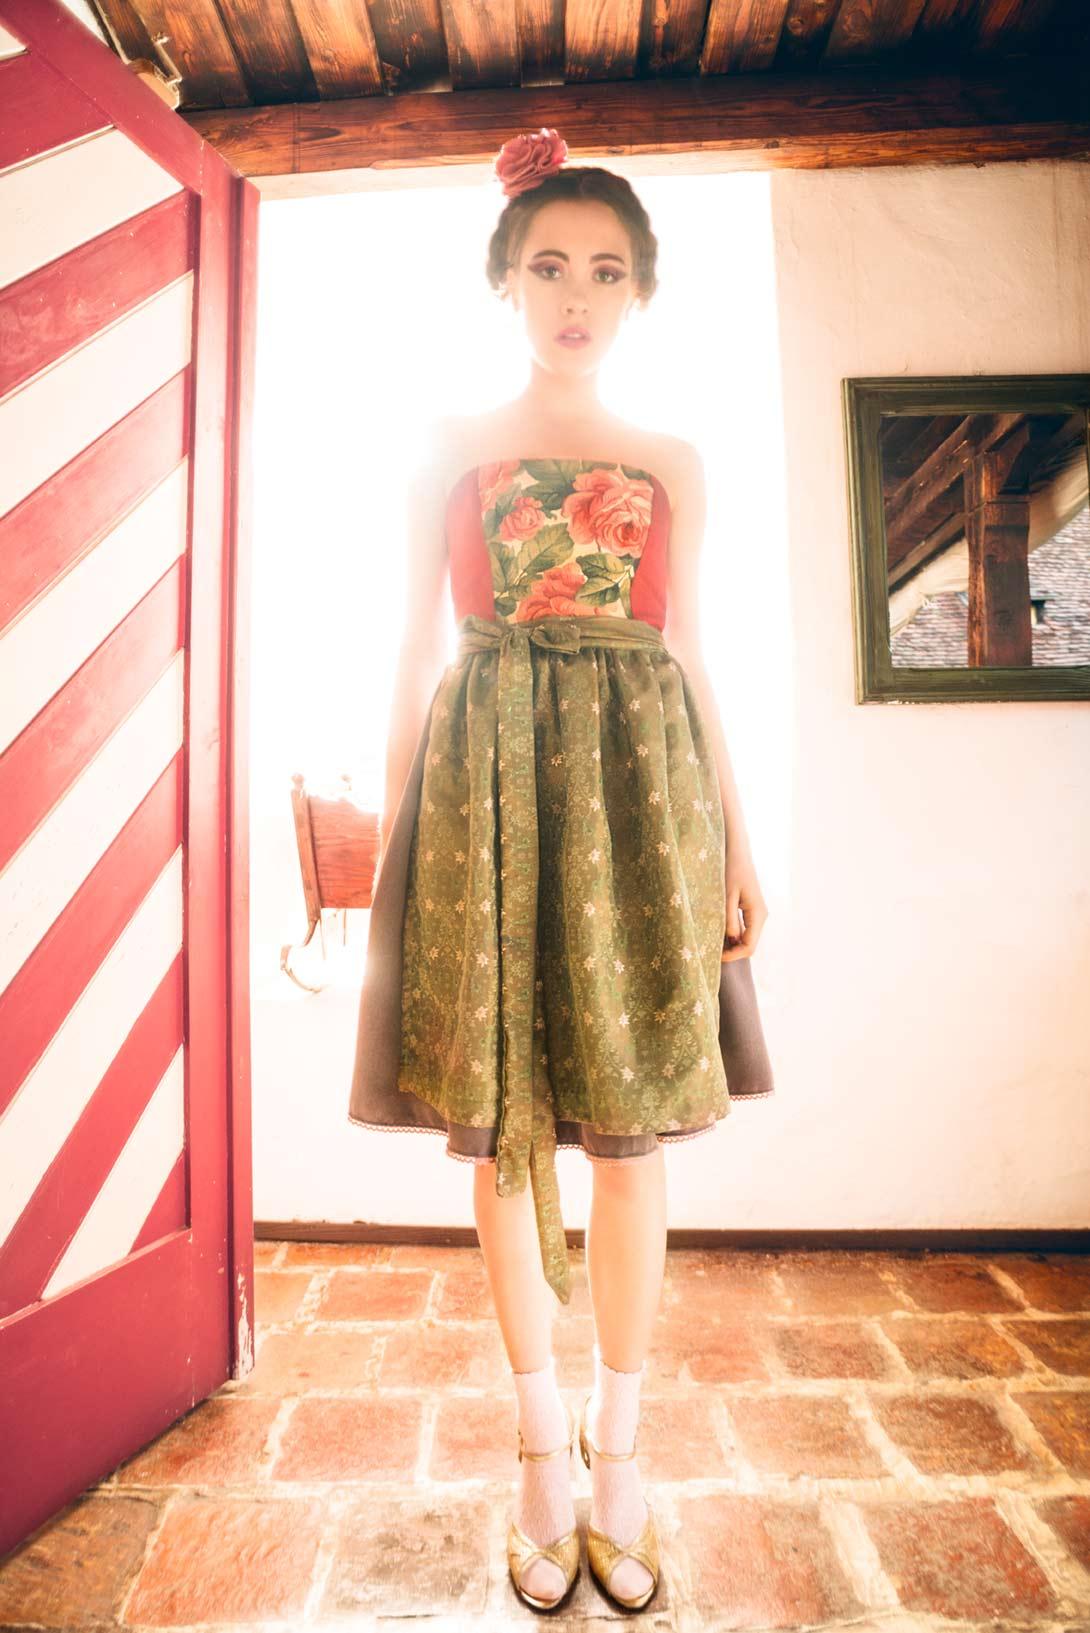 CB_Ga¦ênsebluemchen_Gruenschnabel_Frida_Kahlo_009